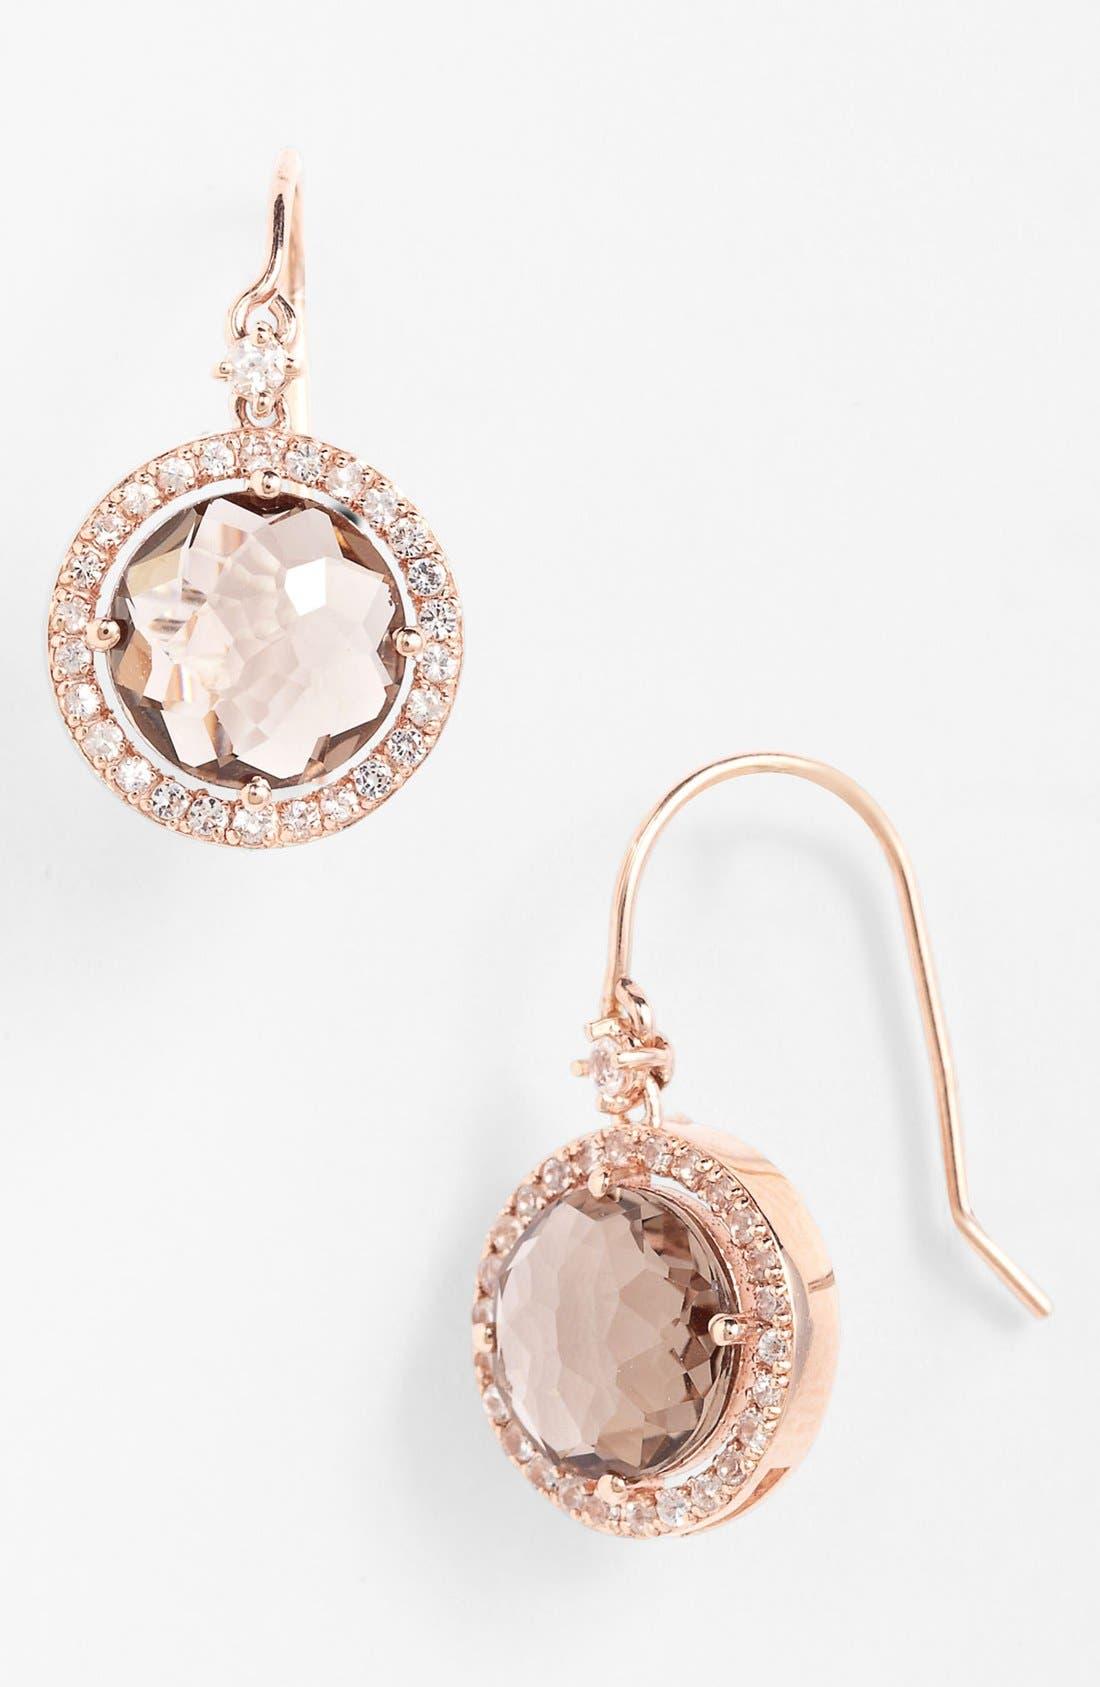 Main Image - KALAN by Suzanne Kalan Drop Earrings